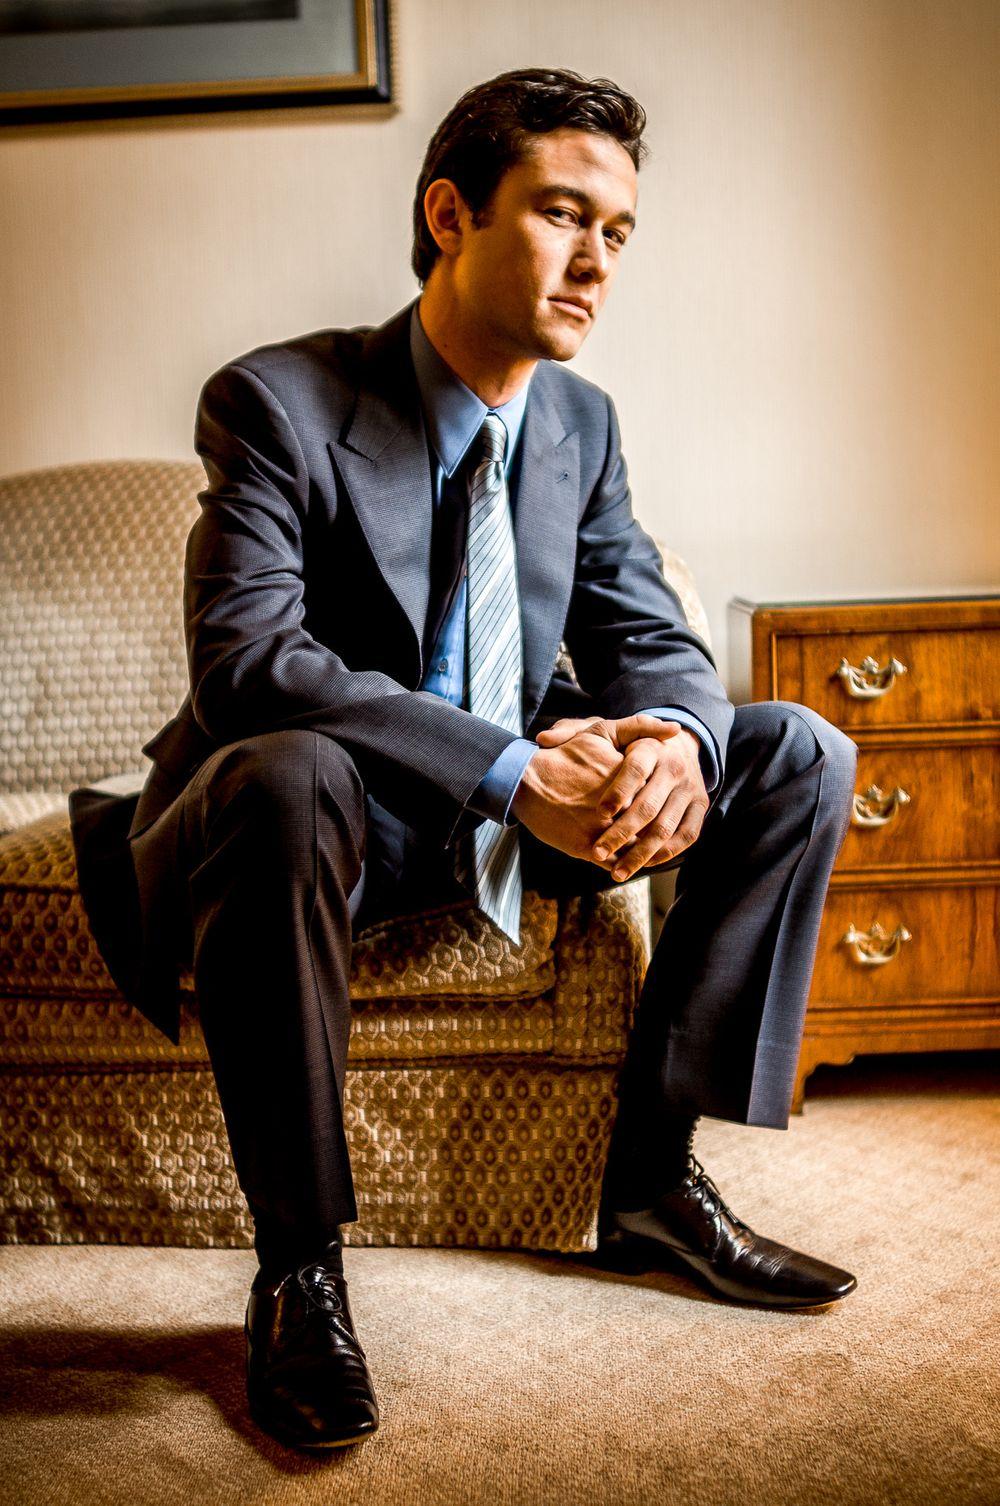 Actor Joseph Gordan-Levitt